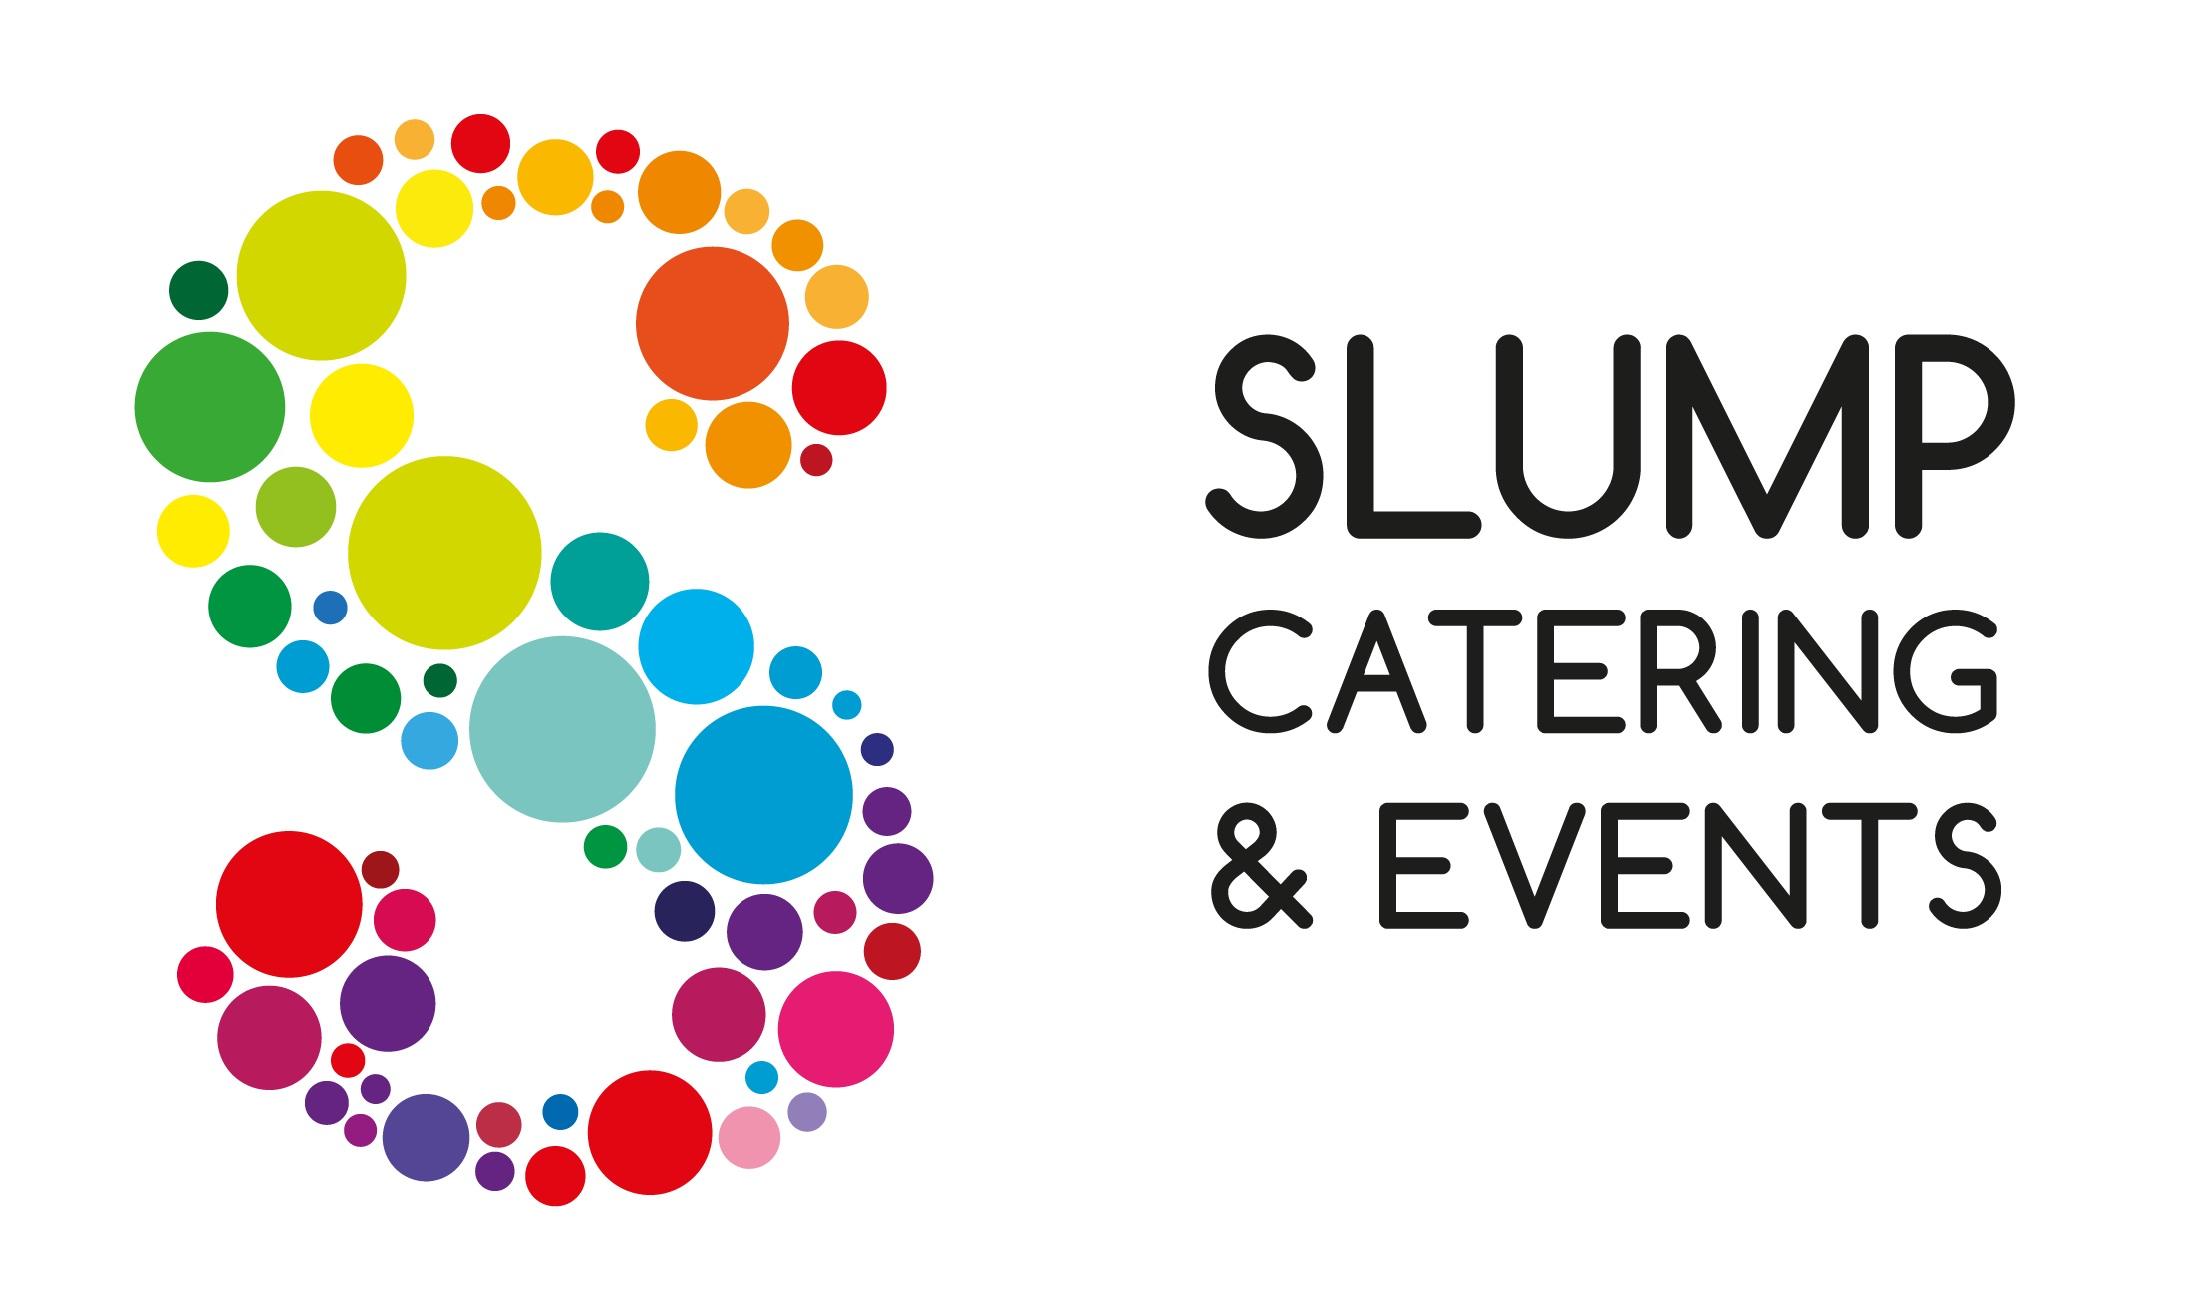 Slump Catering & Events